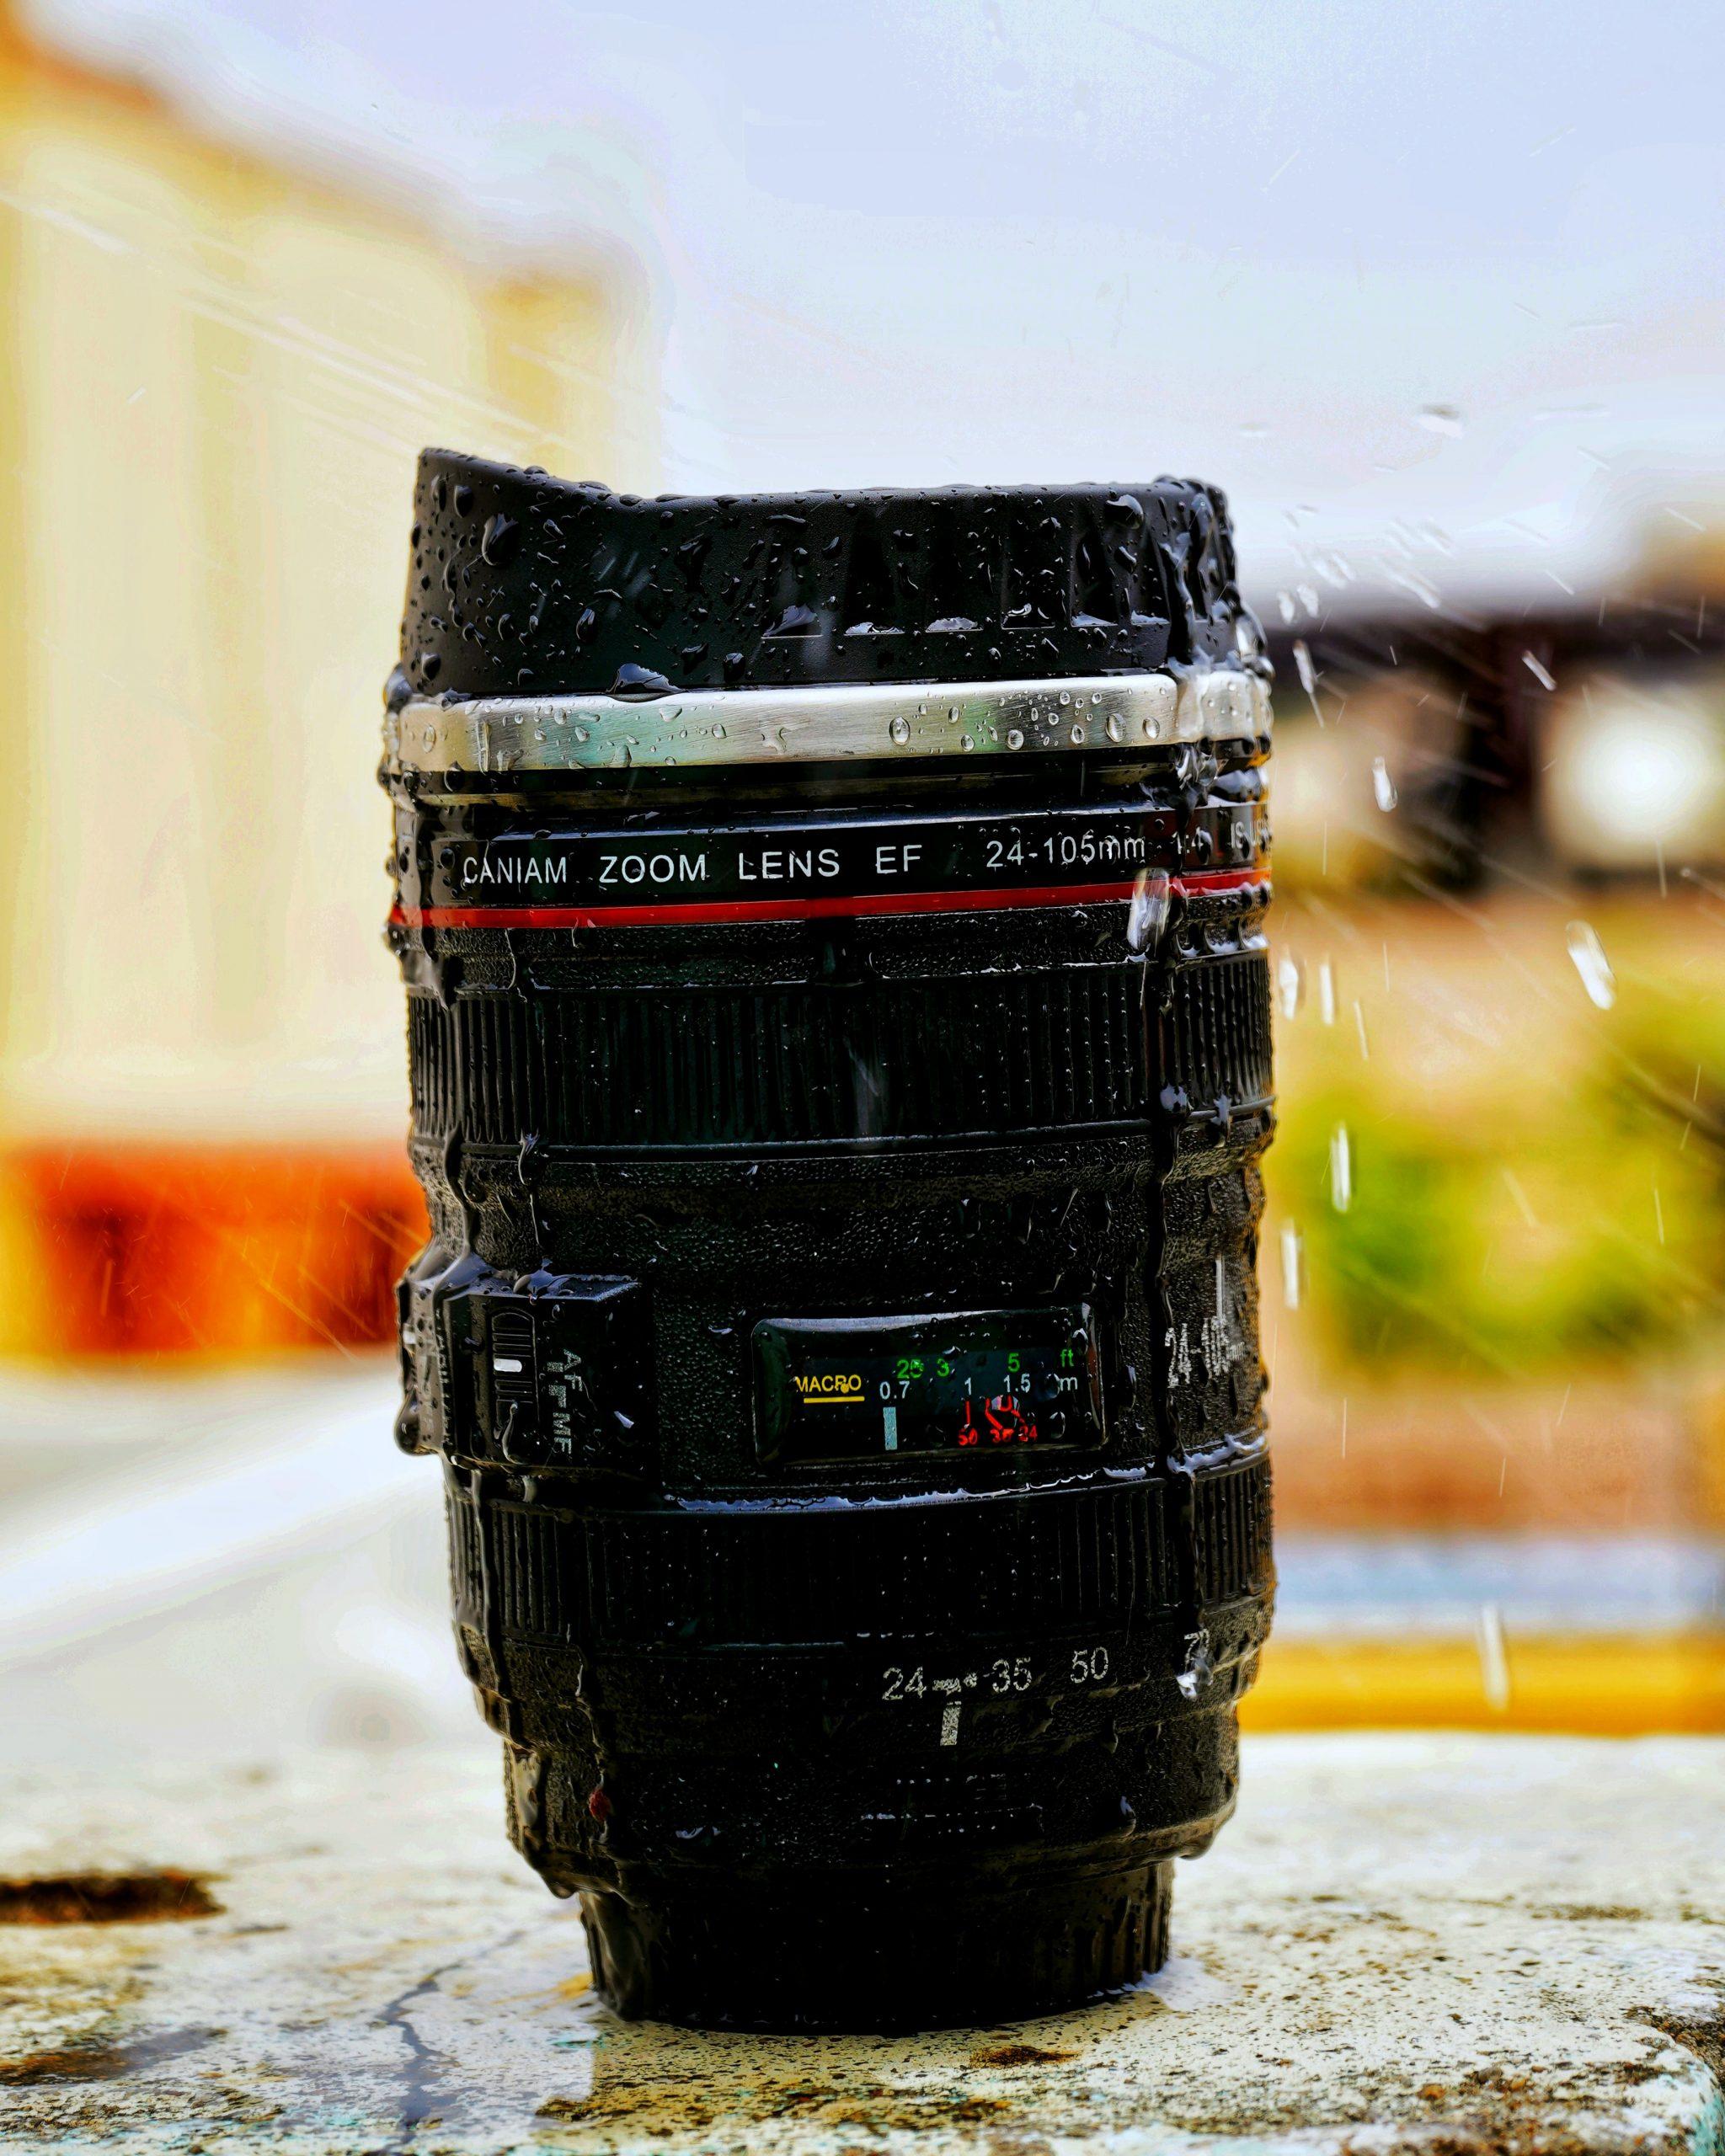 Rain drops falling on a camera lens